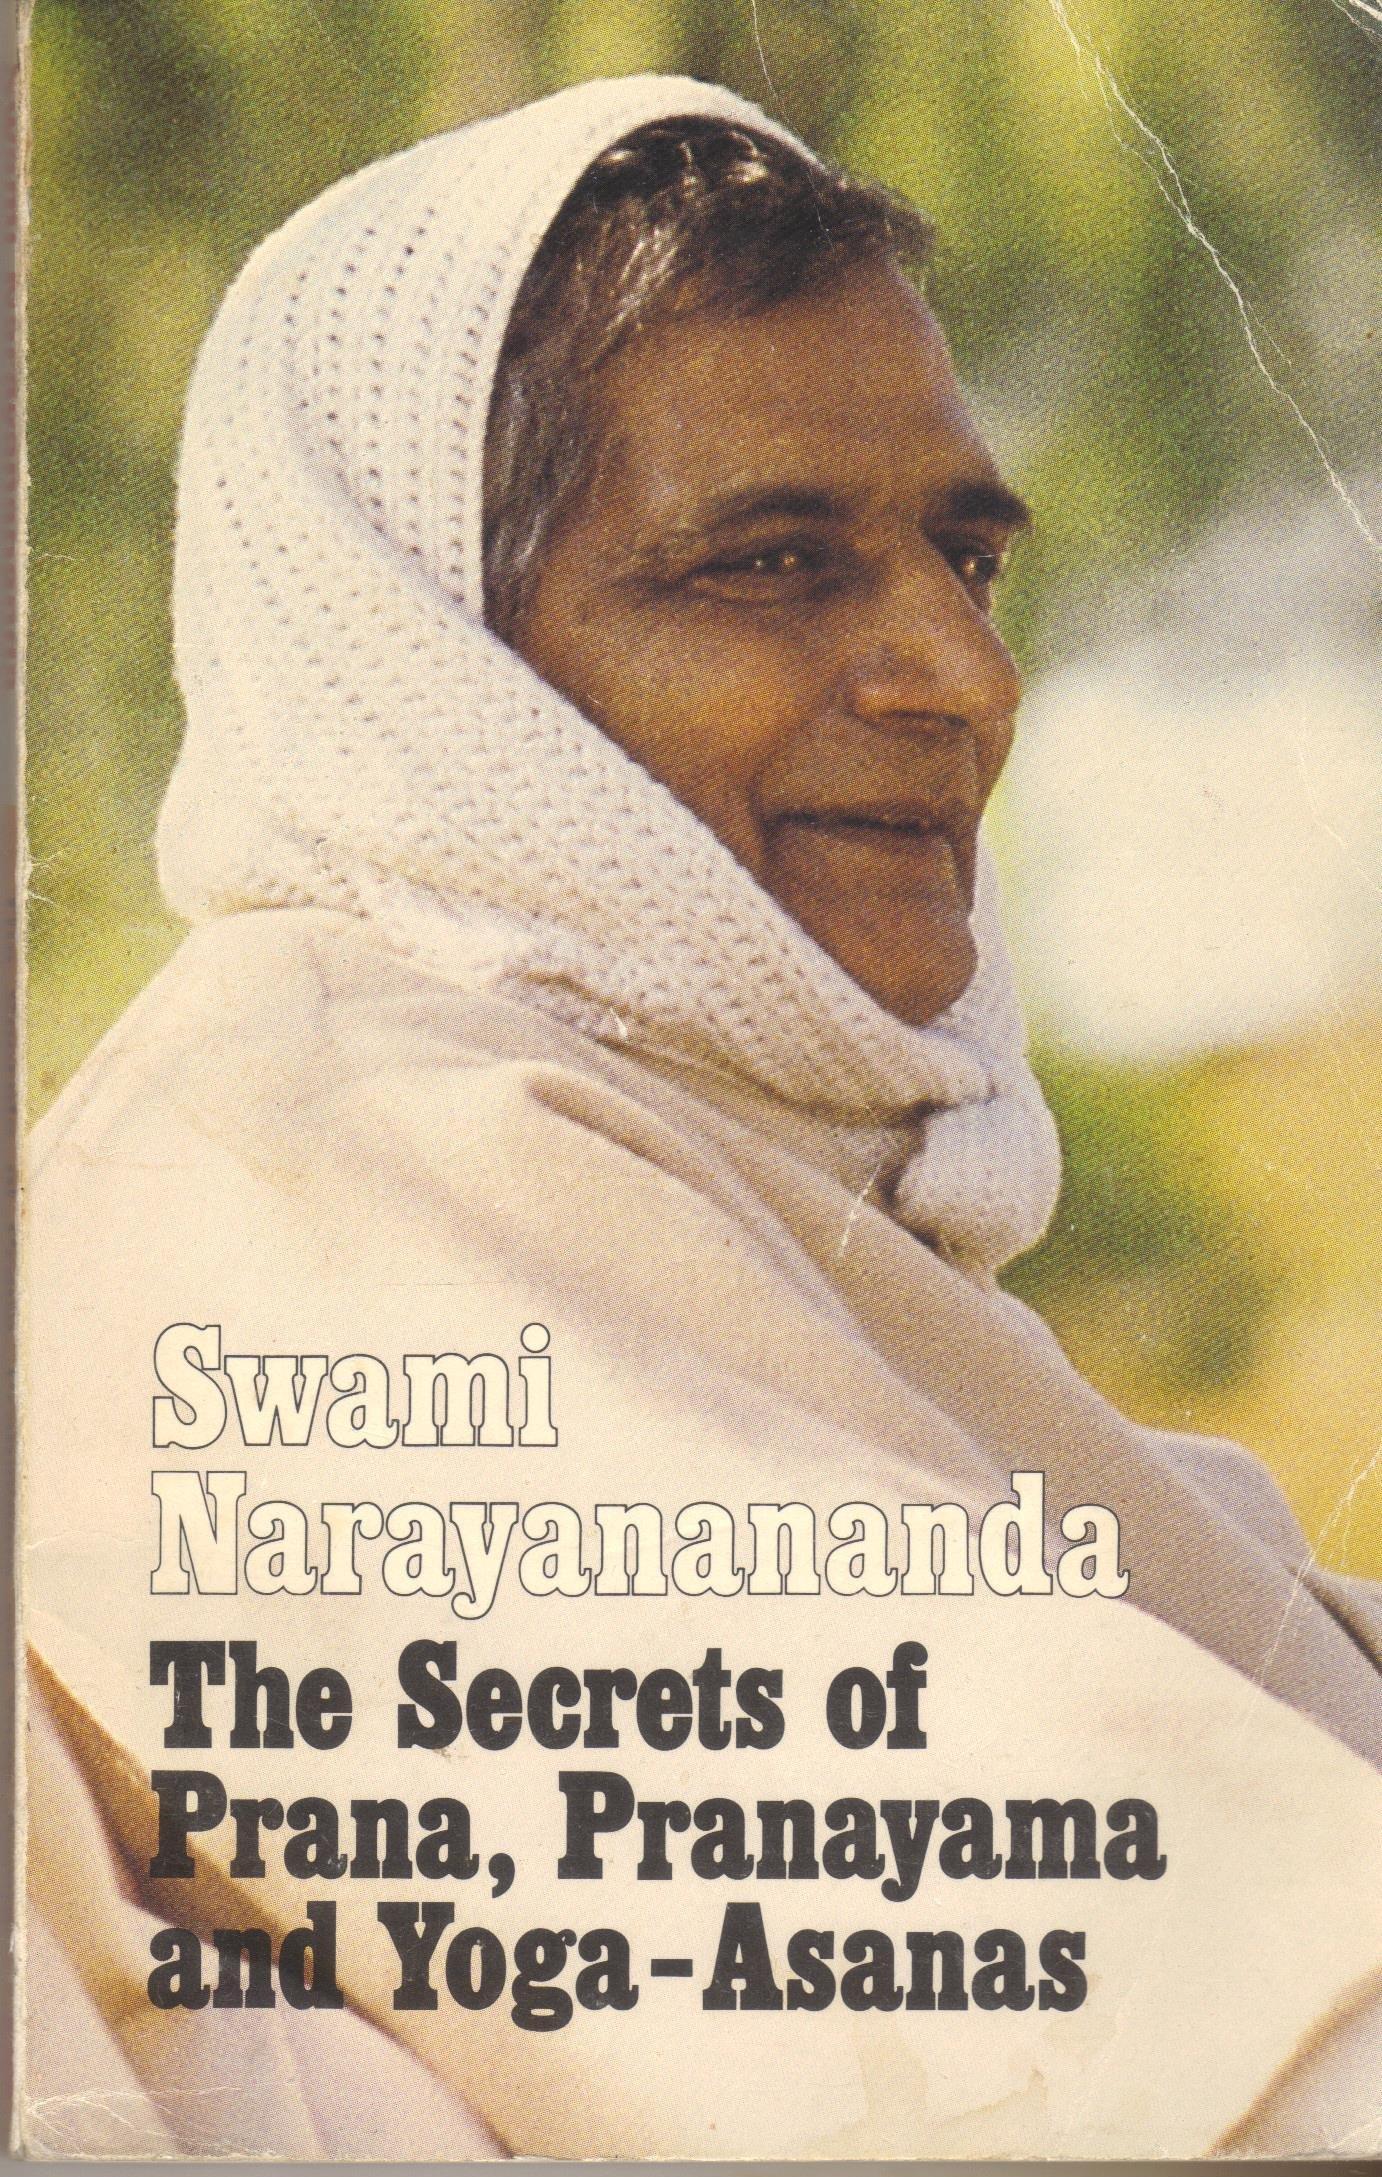 The secrets of Prana, Pranayama & Yoga-asanas (Works of